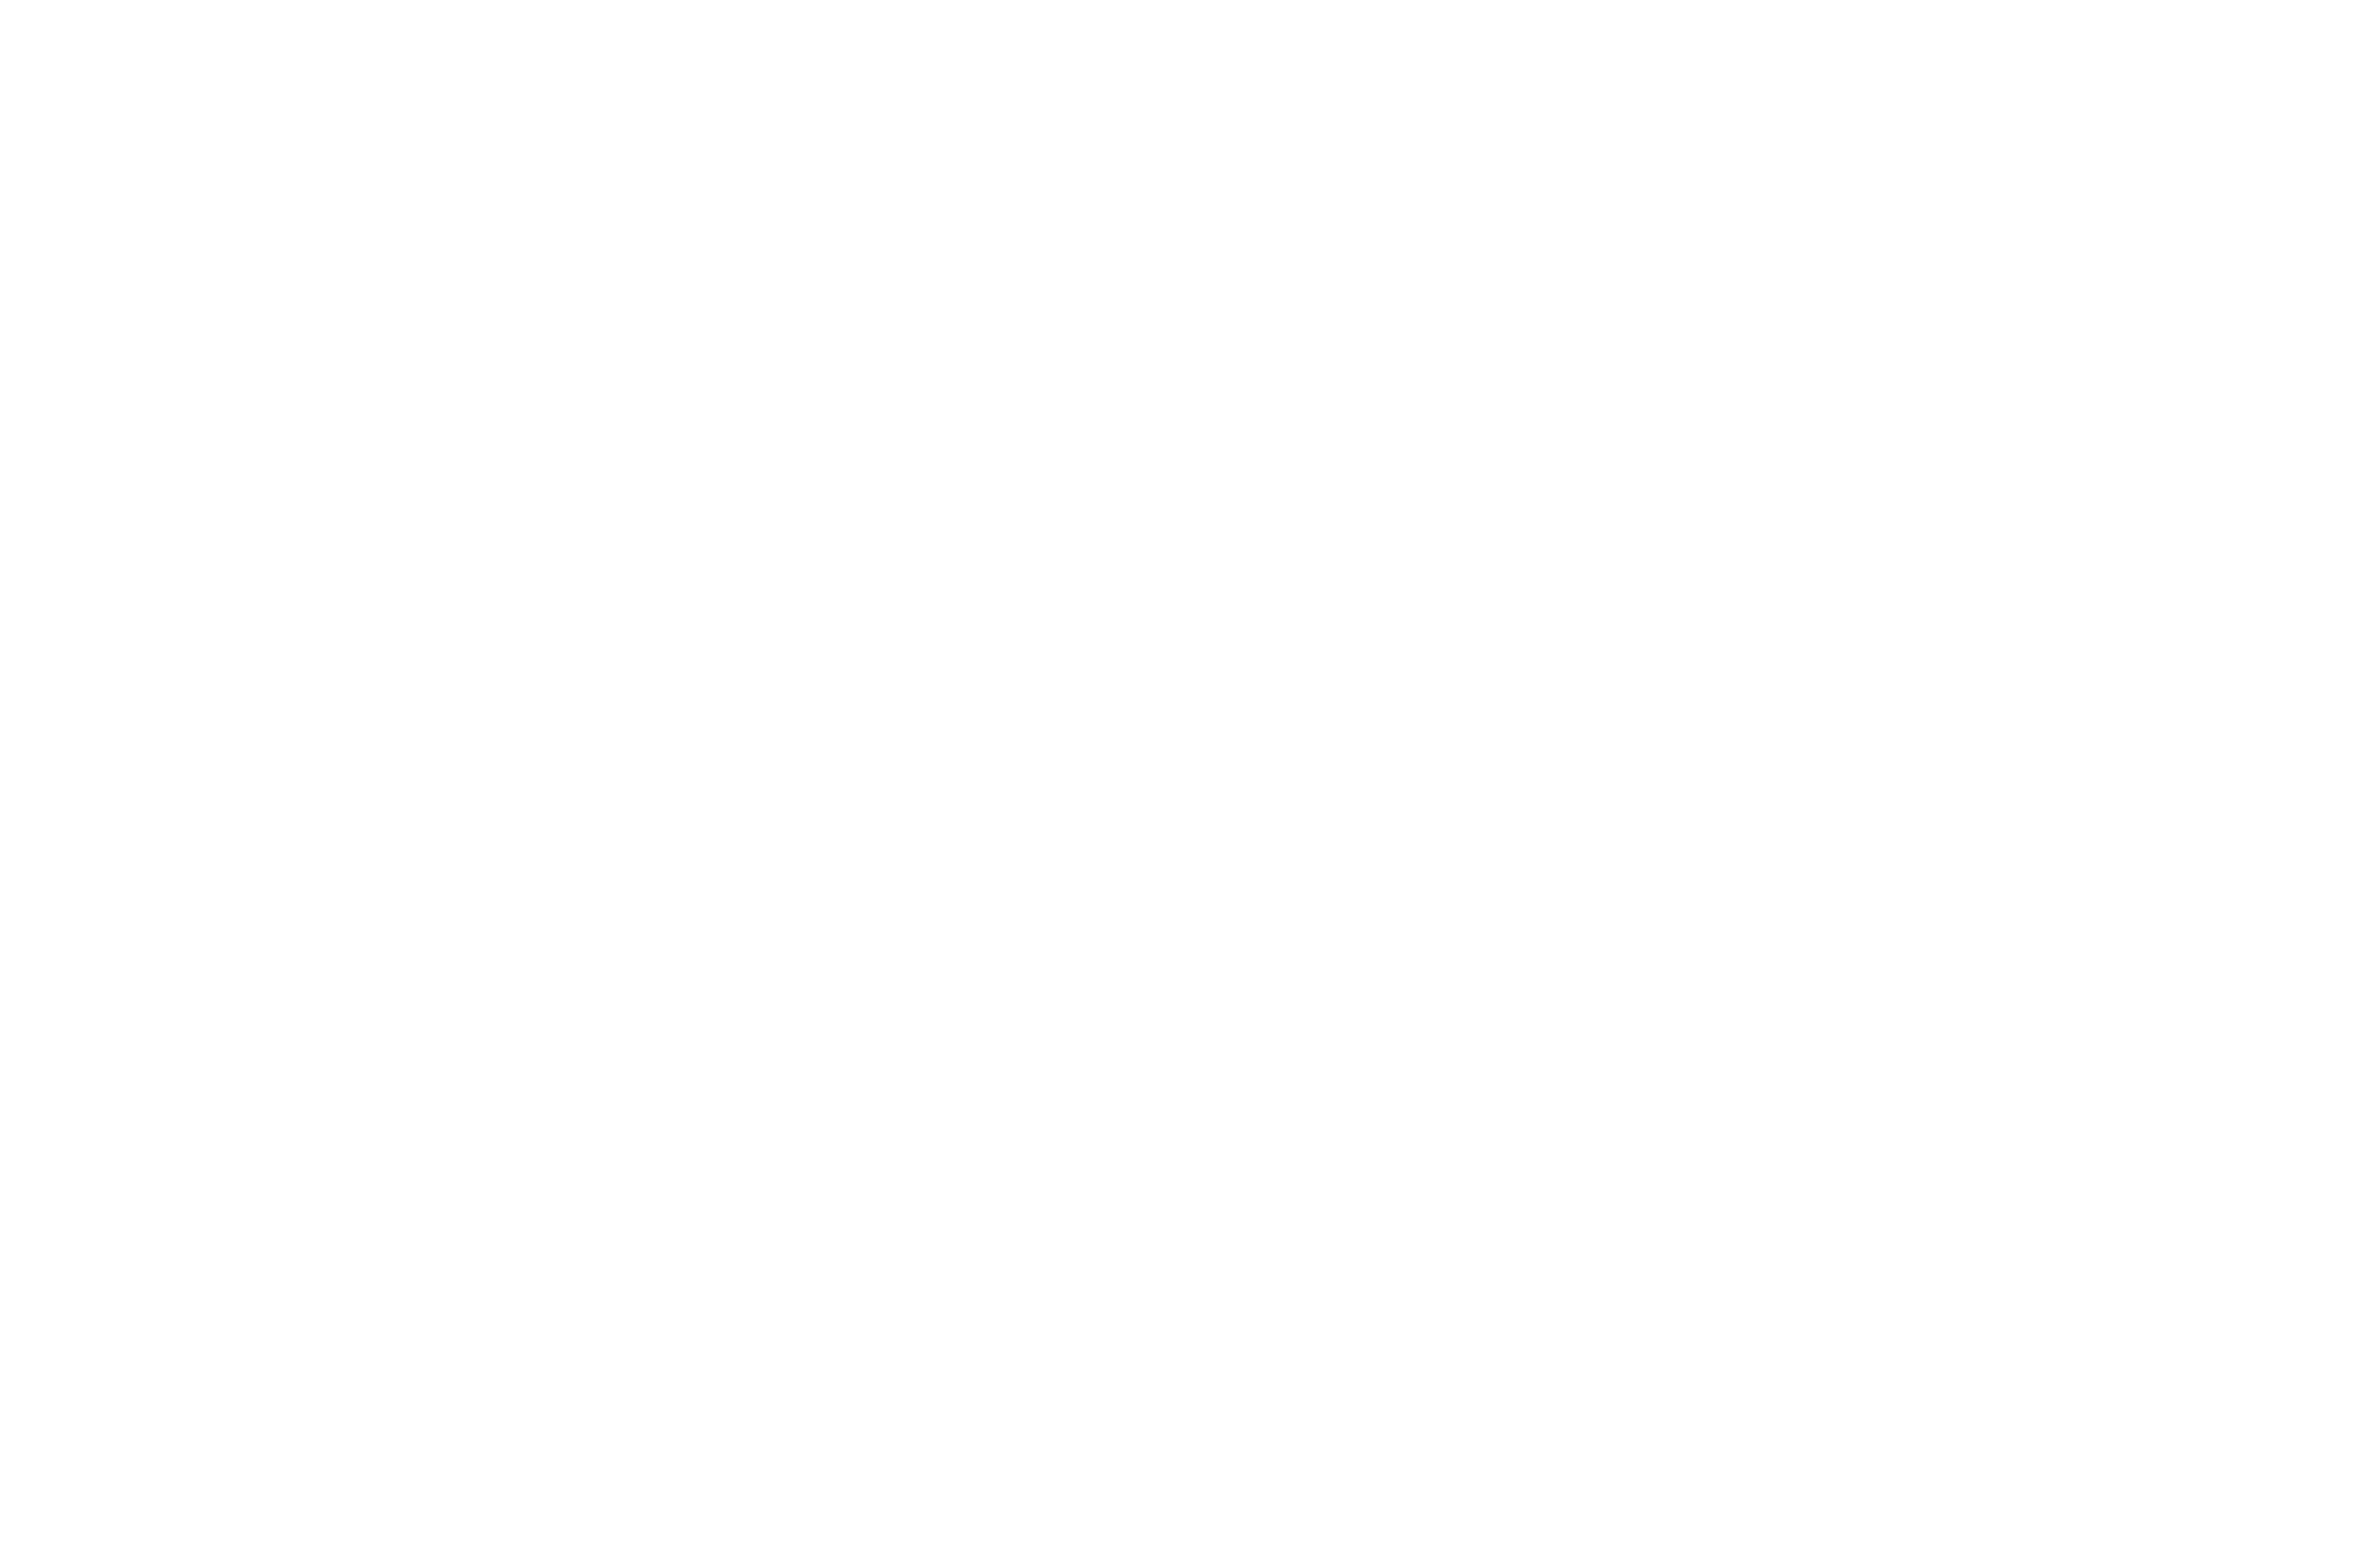 WeDesignYourVision 2-02